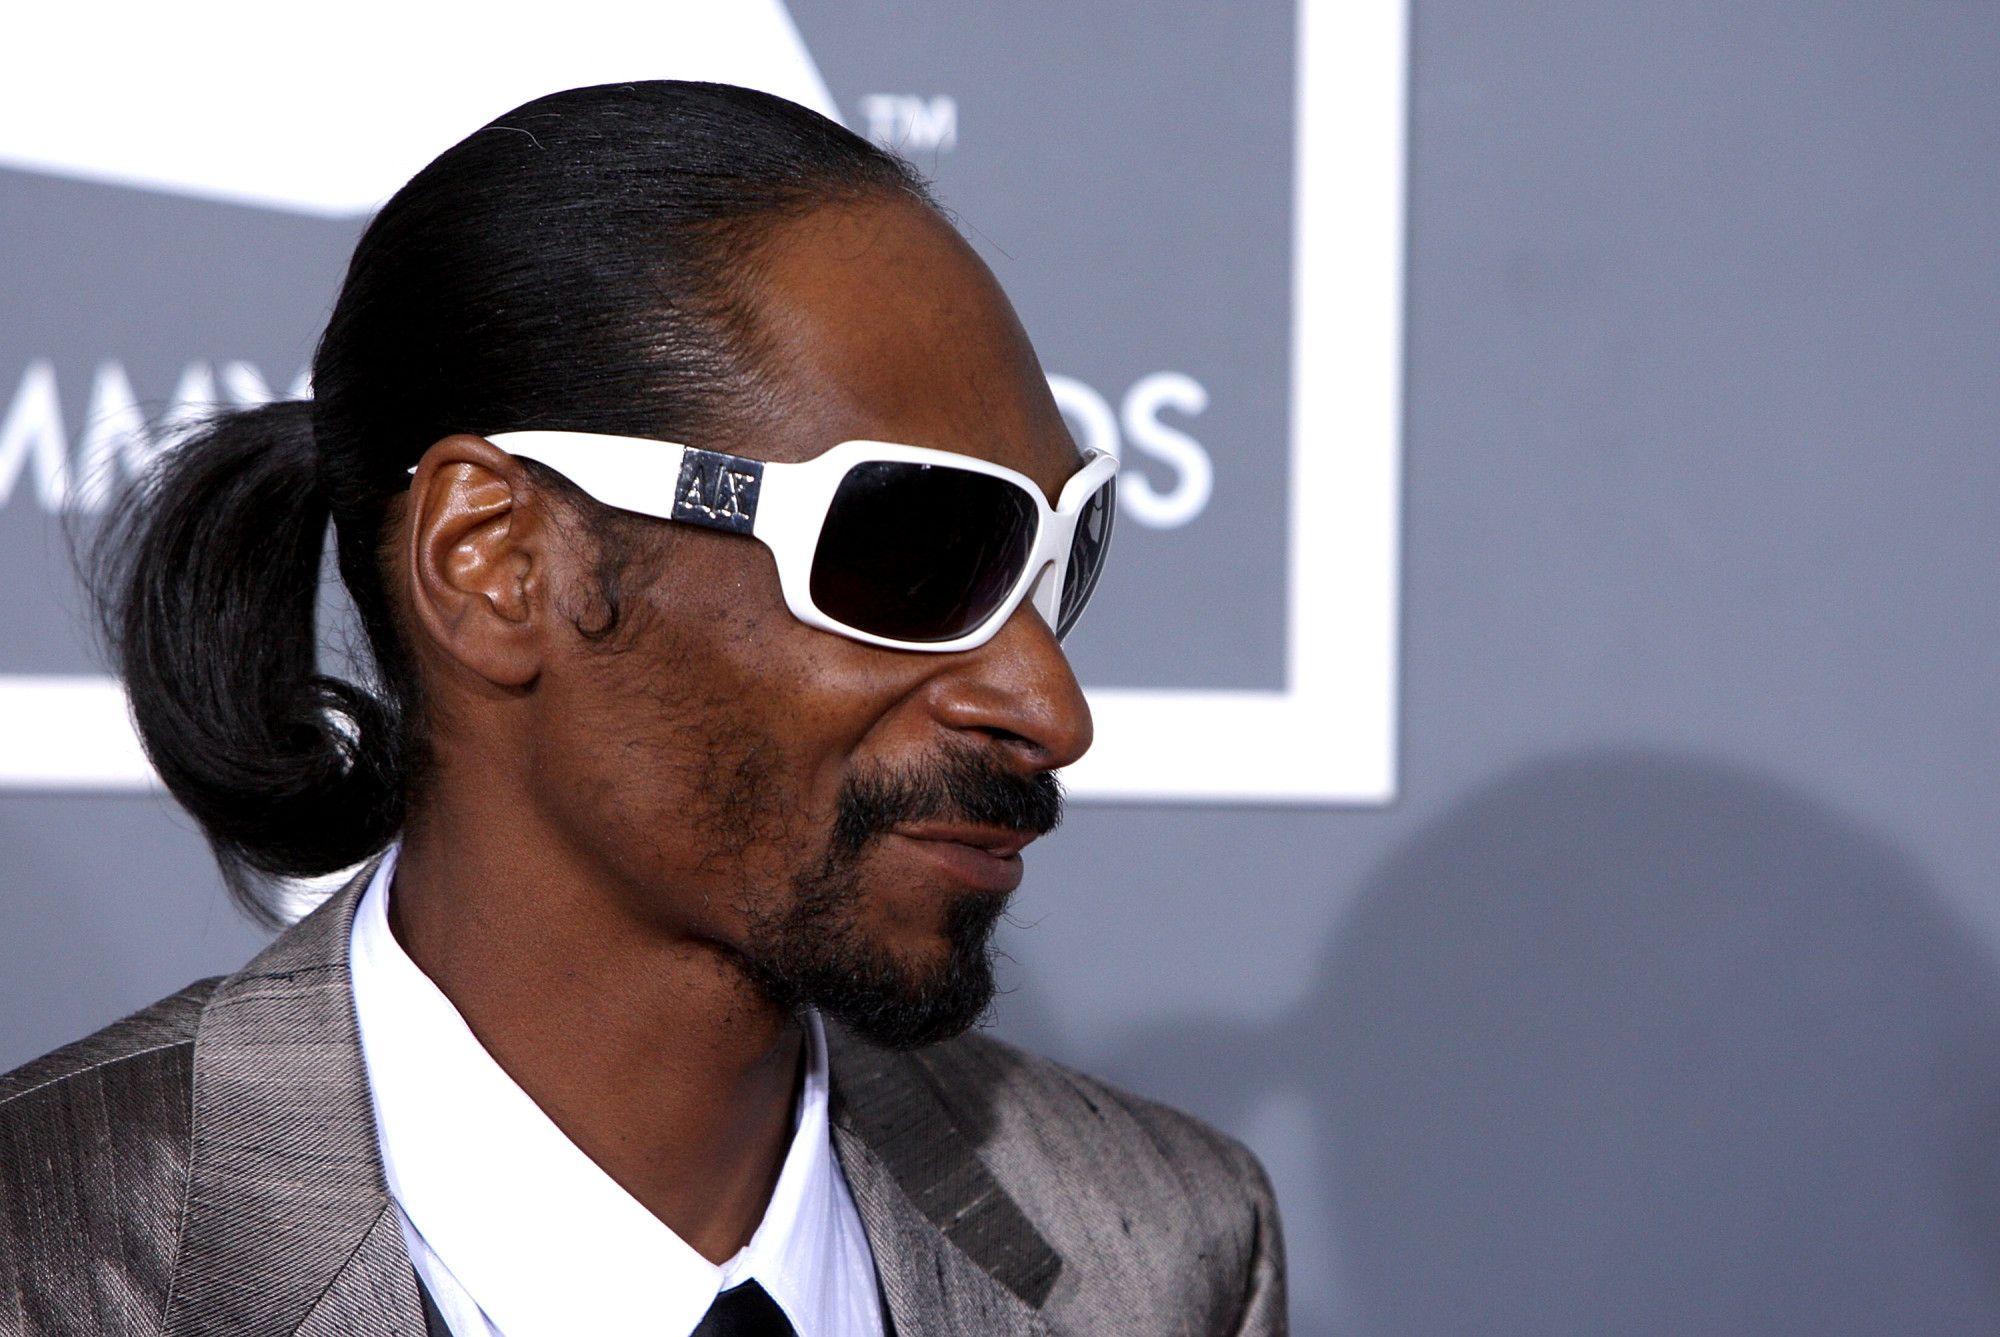 Snoop Dogg Went From Clowning To Threatening Iggy Azalea